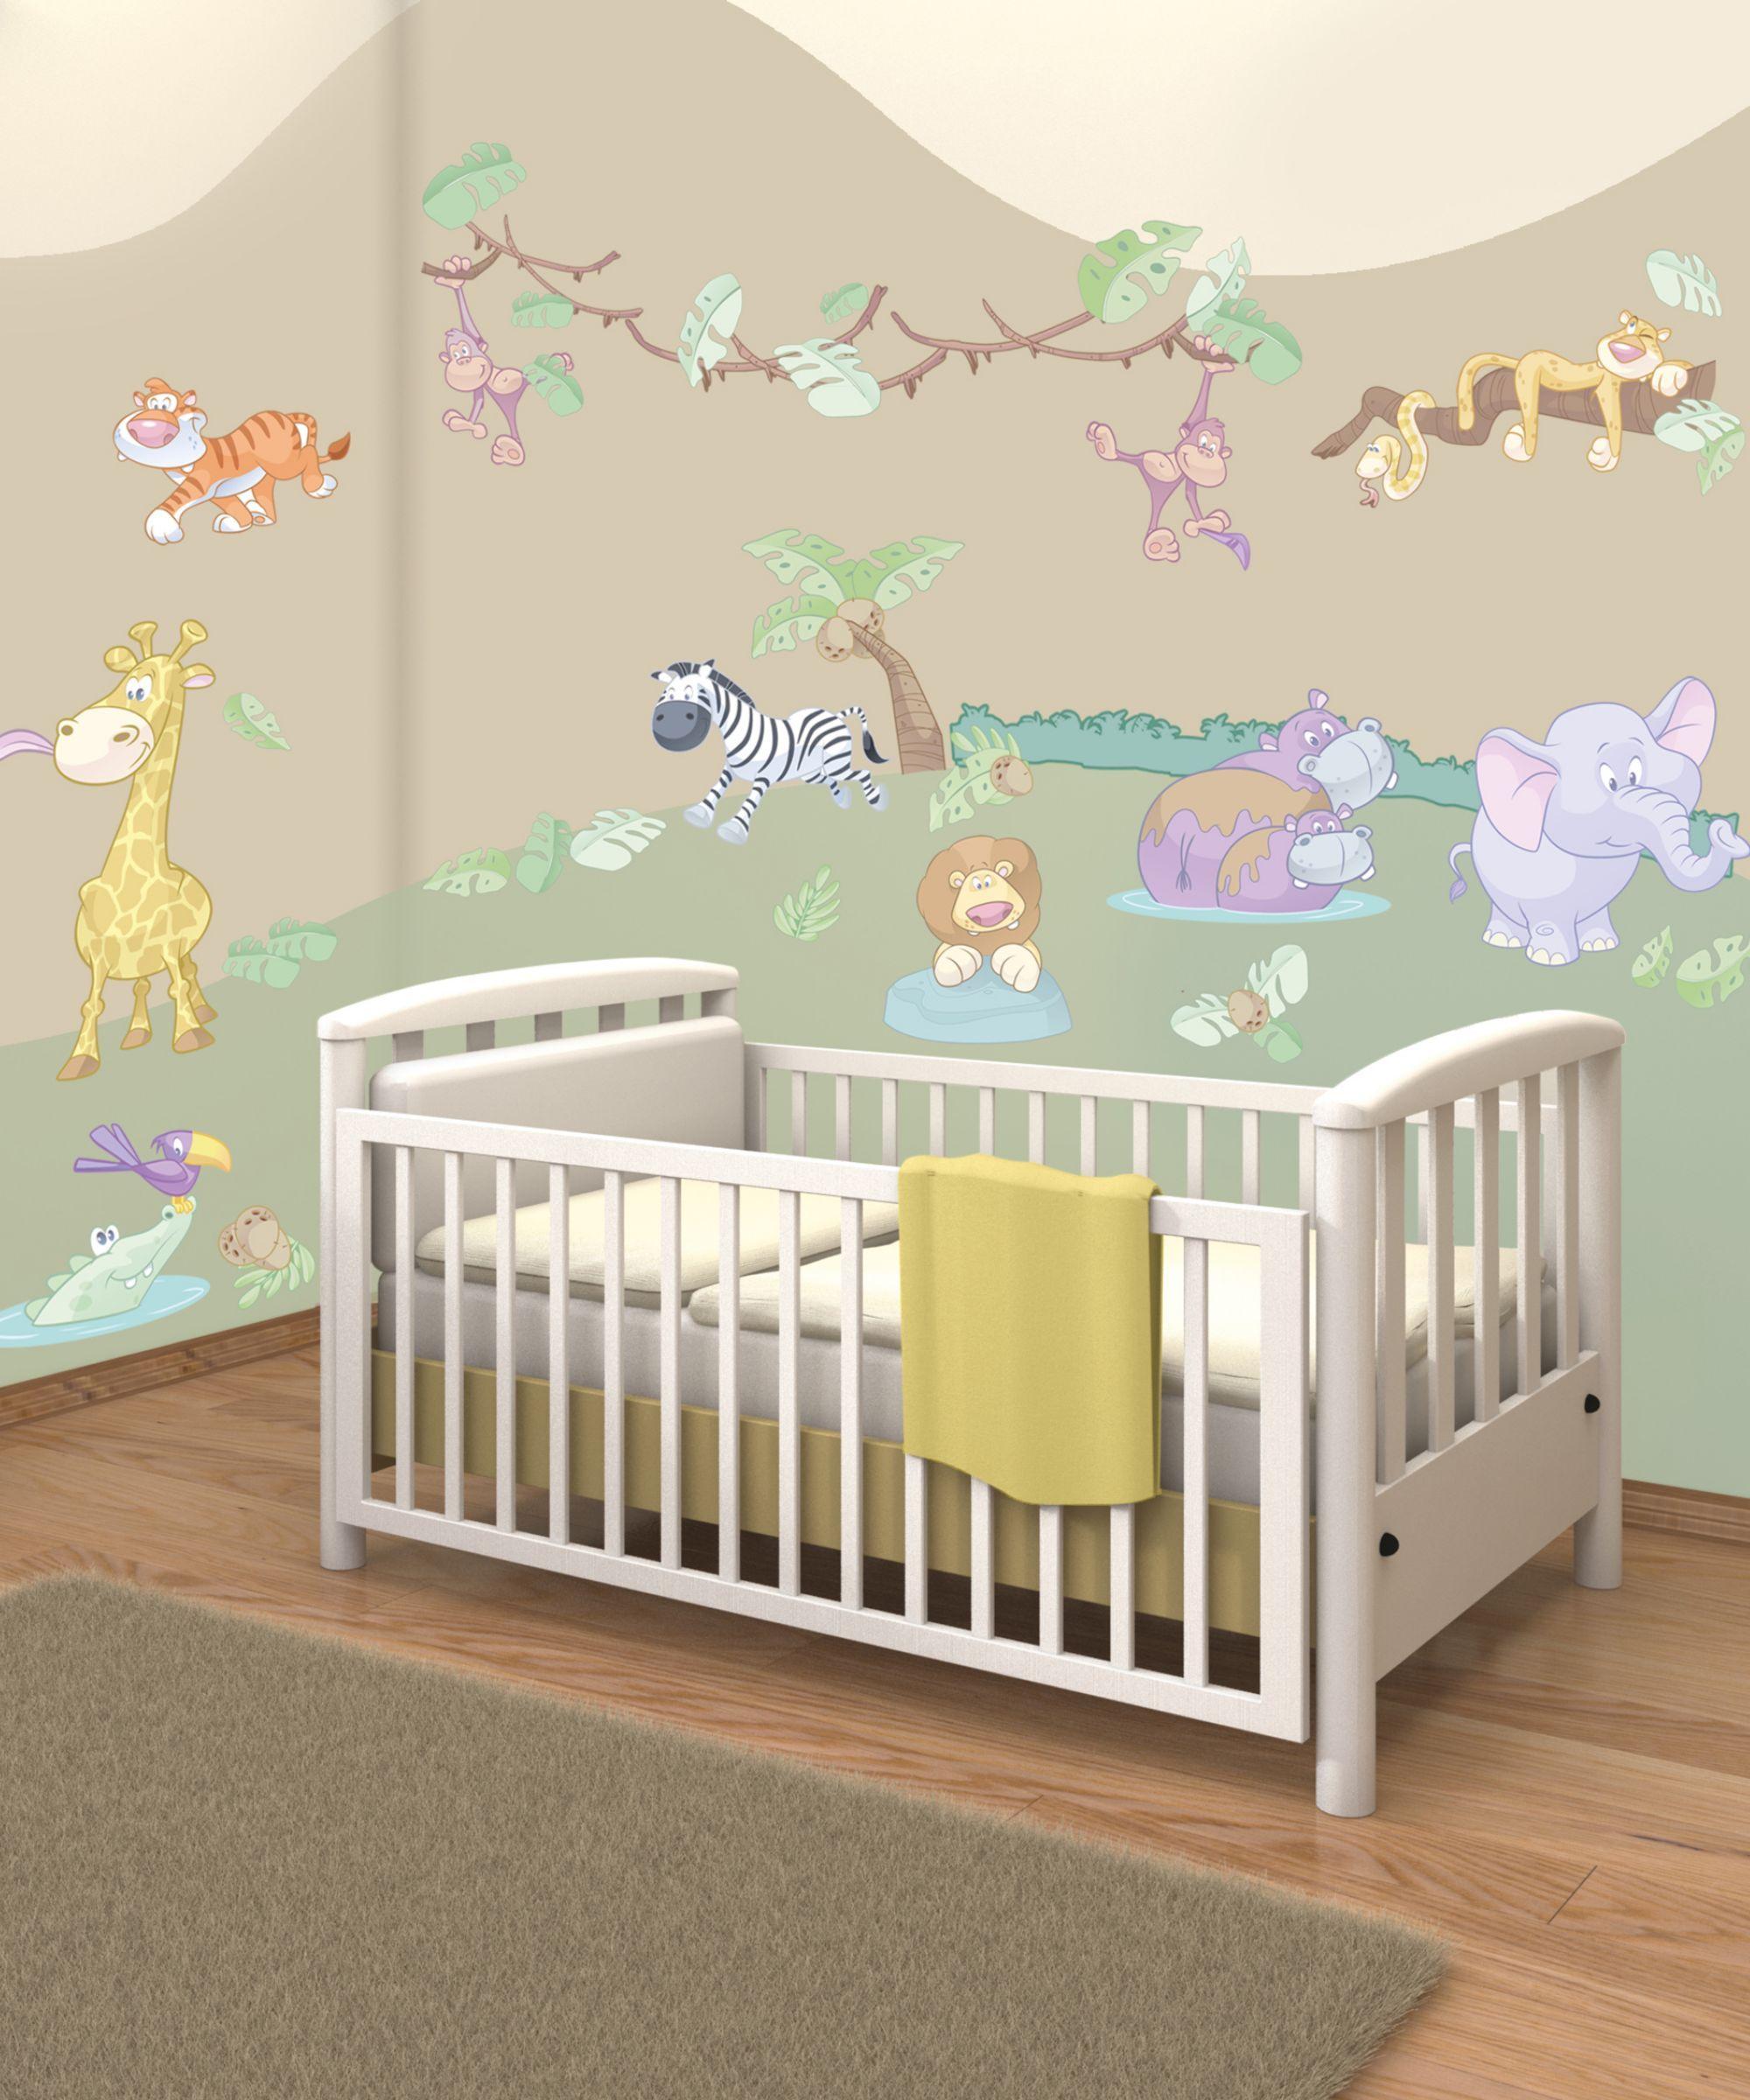 walltastic baby jungle safari room décor kit pinterest safari